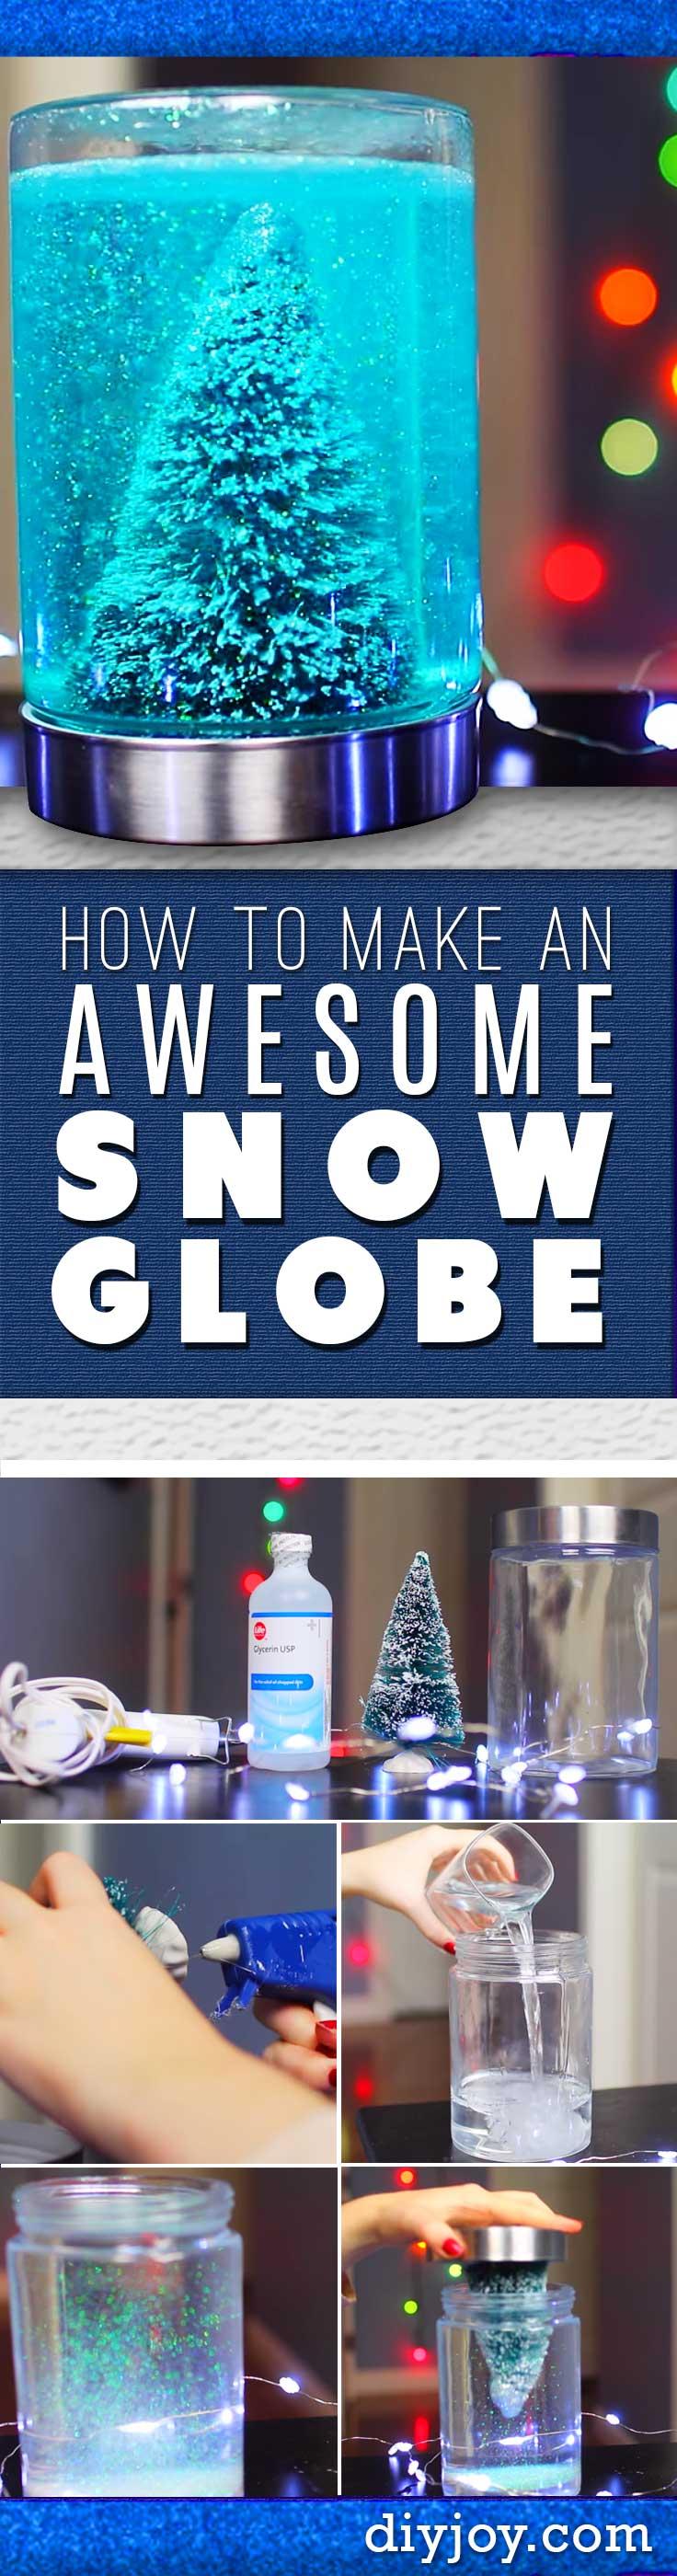 DIY Christmas Decorations - Homemade Christmas Crafts - How To Make A Snow Globe in A Mason Jar Tutorial